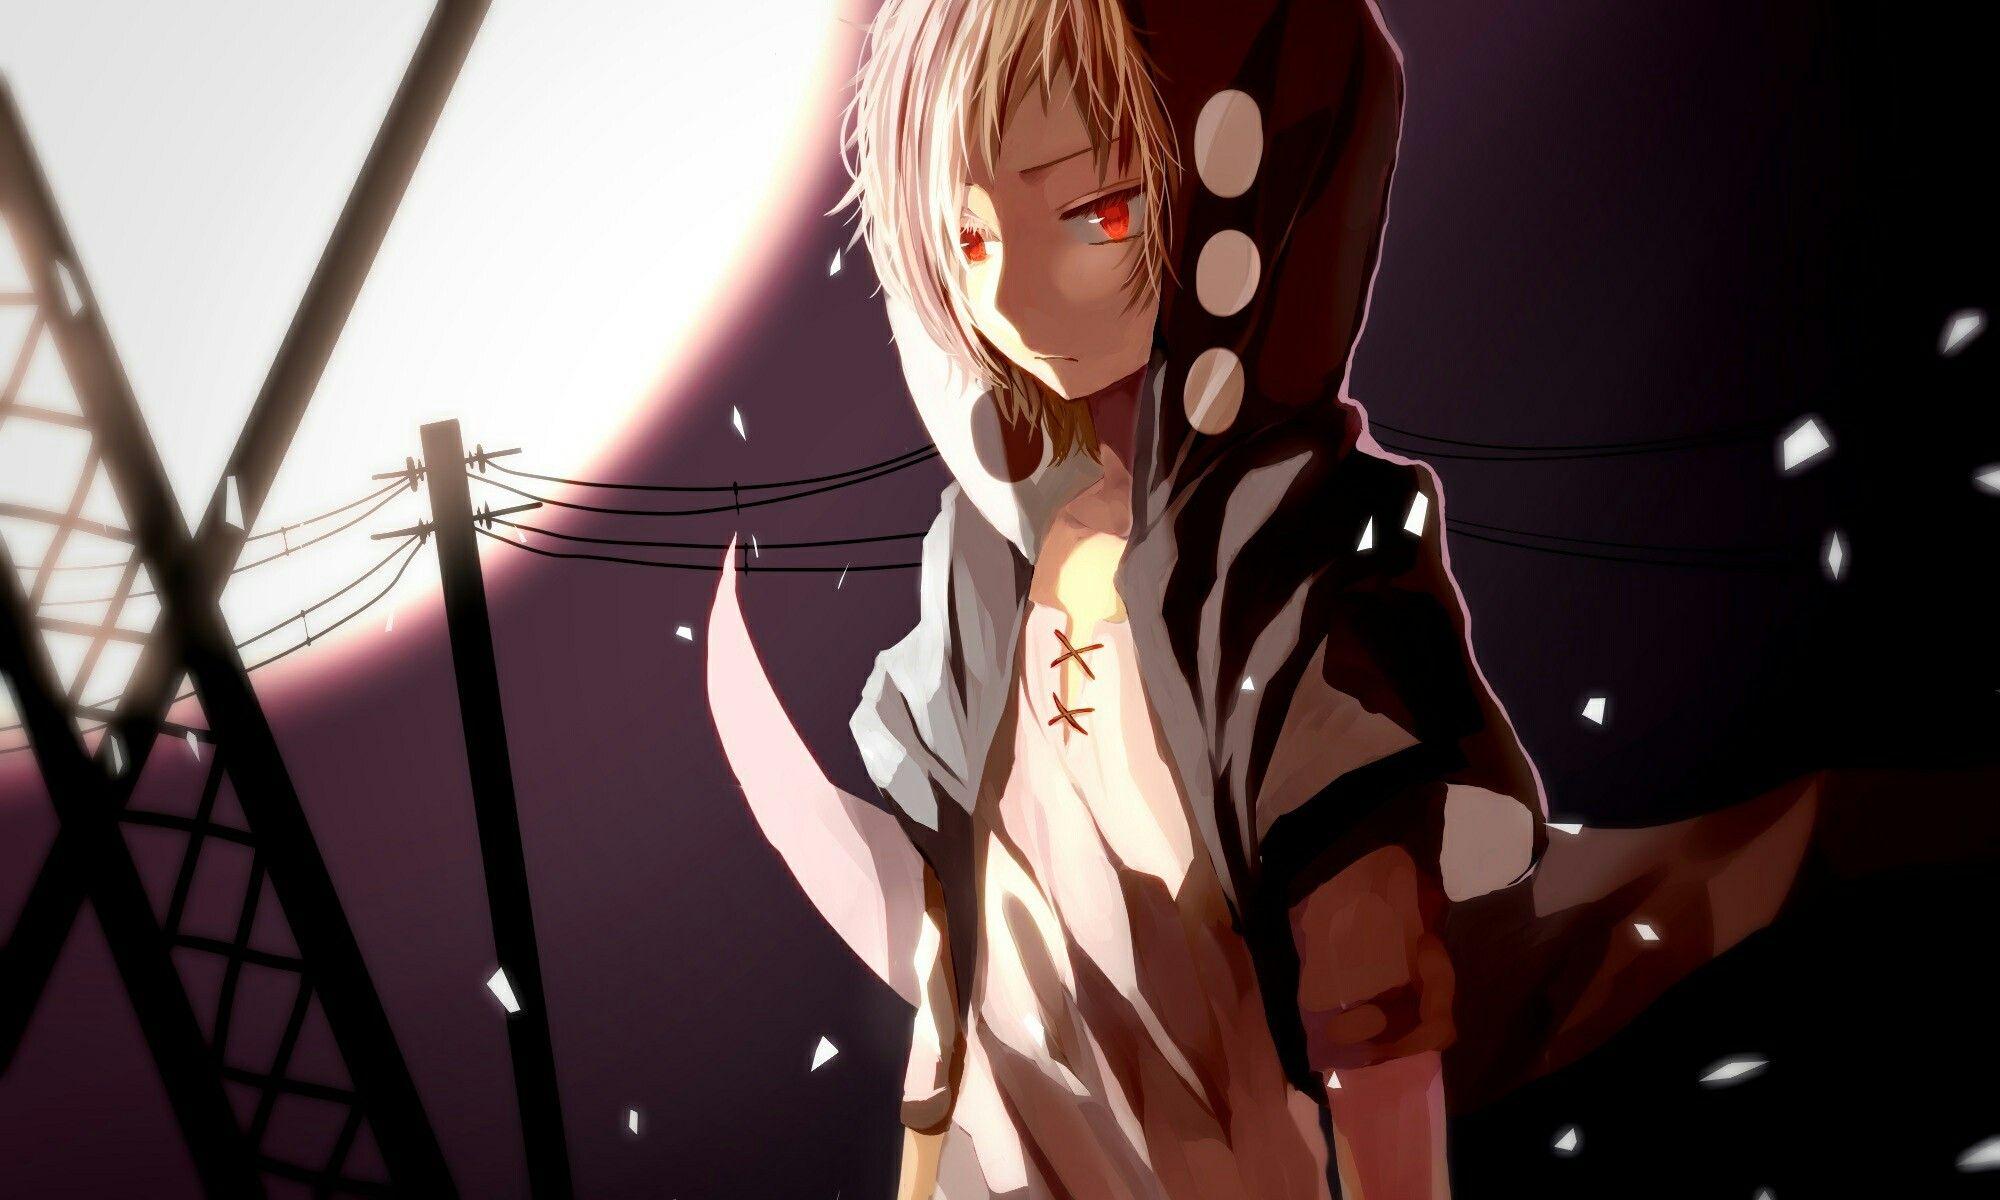 Pin by wendy_live_uwu_ on Anime World Anime, Anime